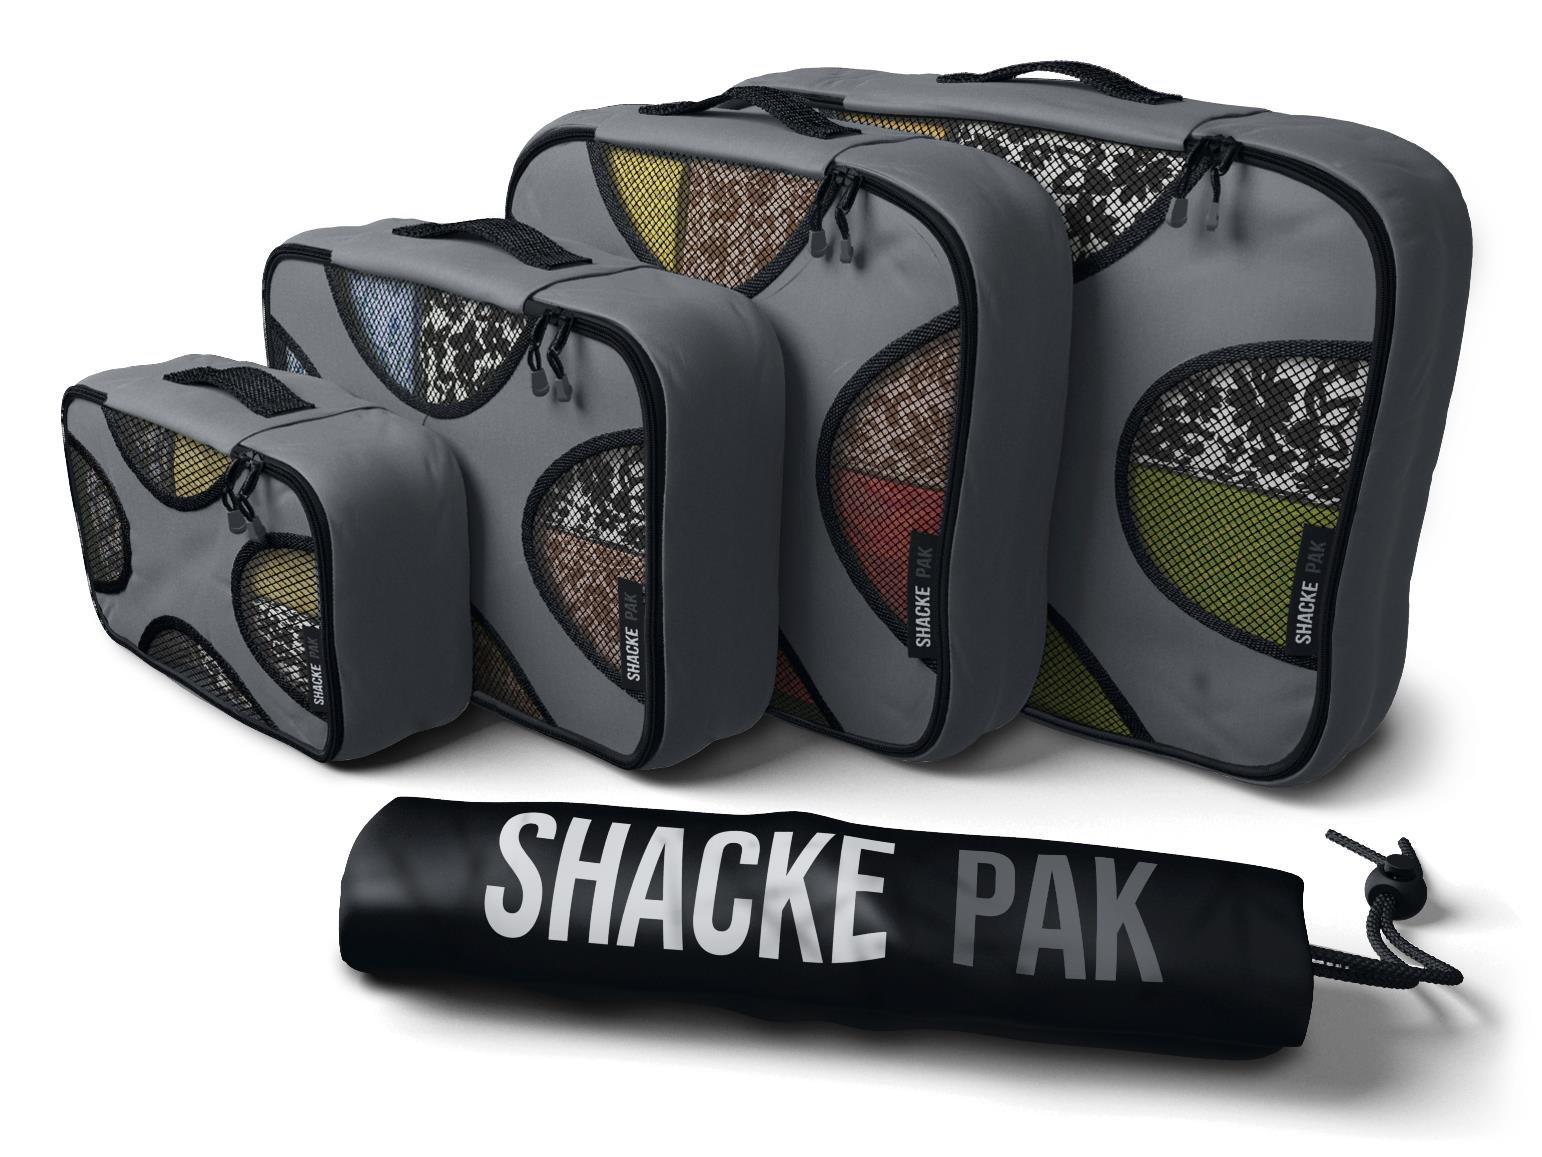 Shacke Pak - 4 Set Packing Cubes - Travel Organizers with Laundry Bag (Dark Grey) by Shacke